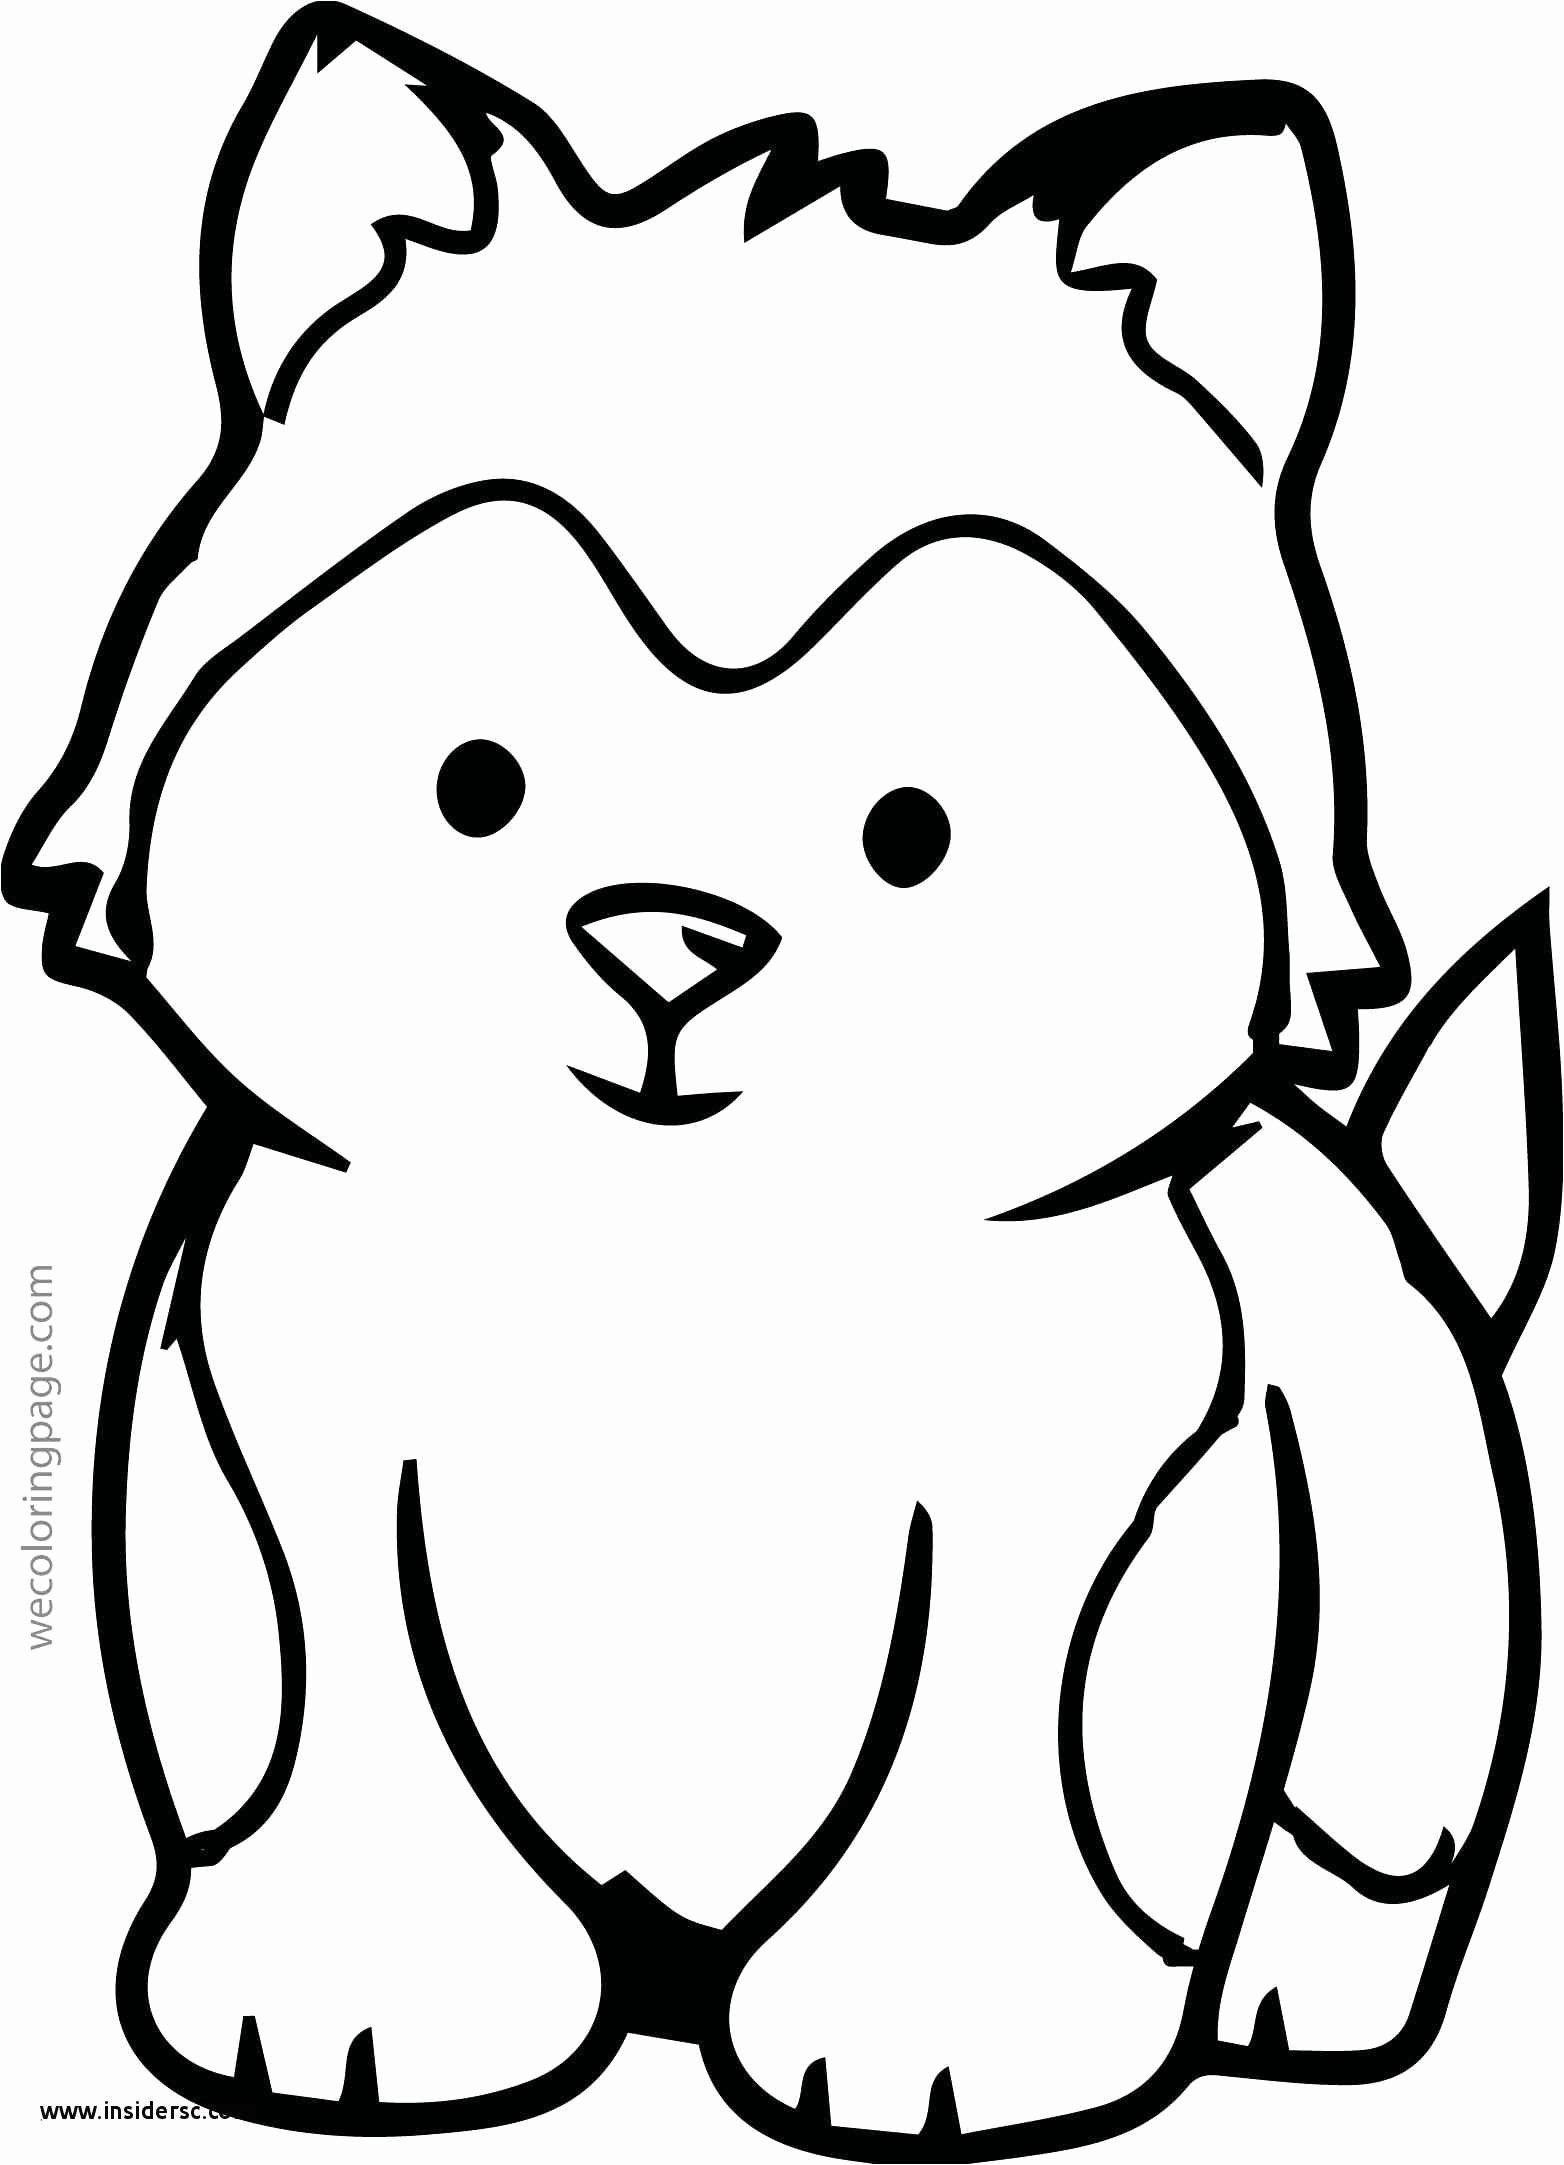 Kawaii Drawing Book Elegant Cute Kawaii Animal Coloring Pages Luxury Creative Cuties Dog Coloring Page Farm Animal Coloring Pages Zoo Animal Coloring Pages